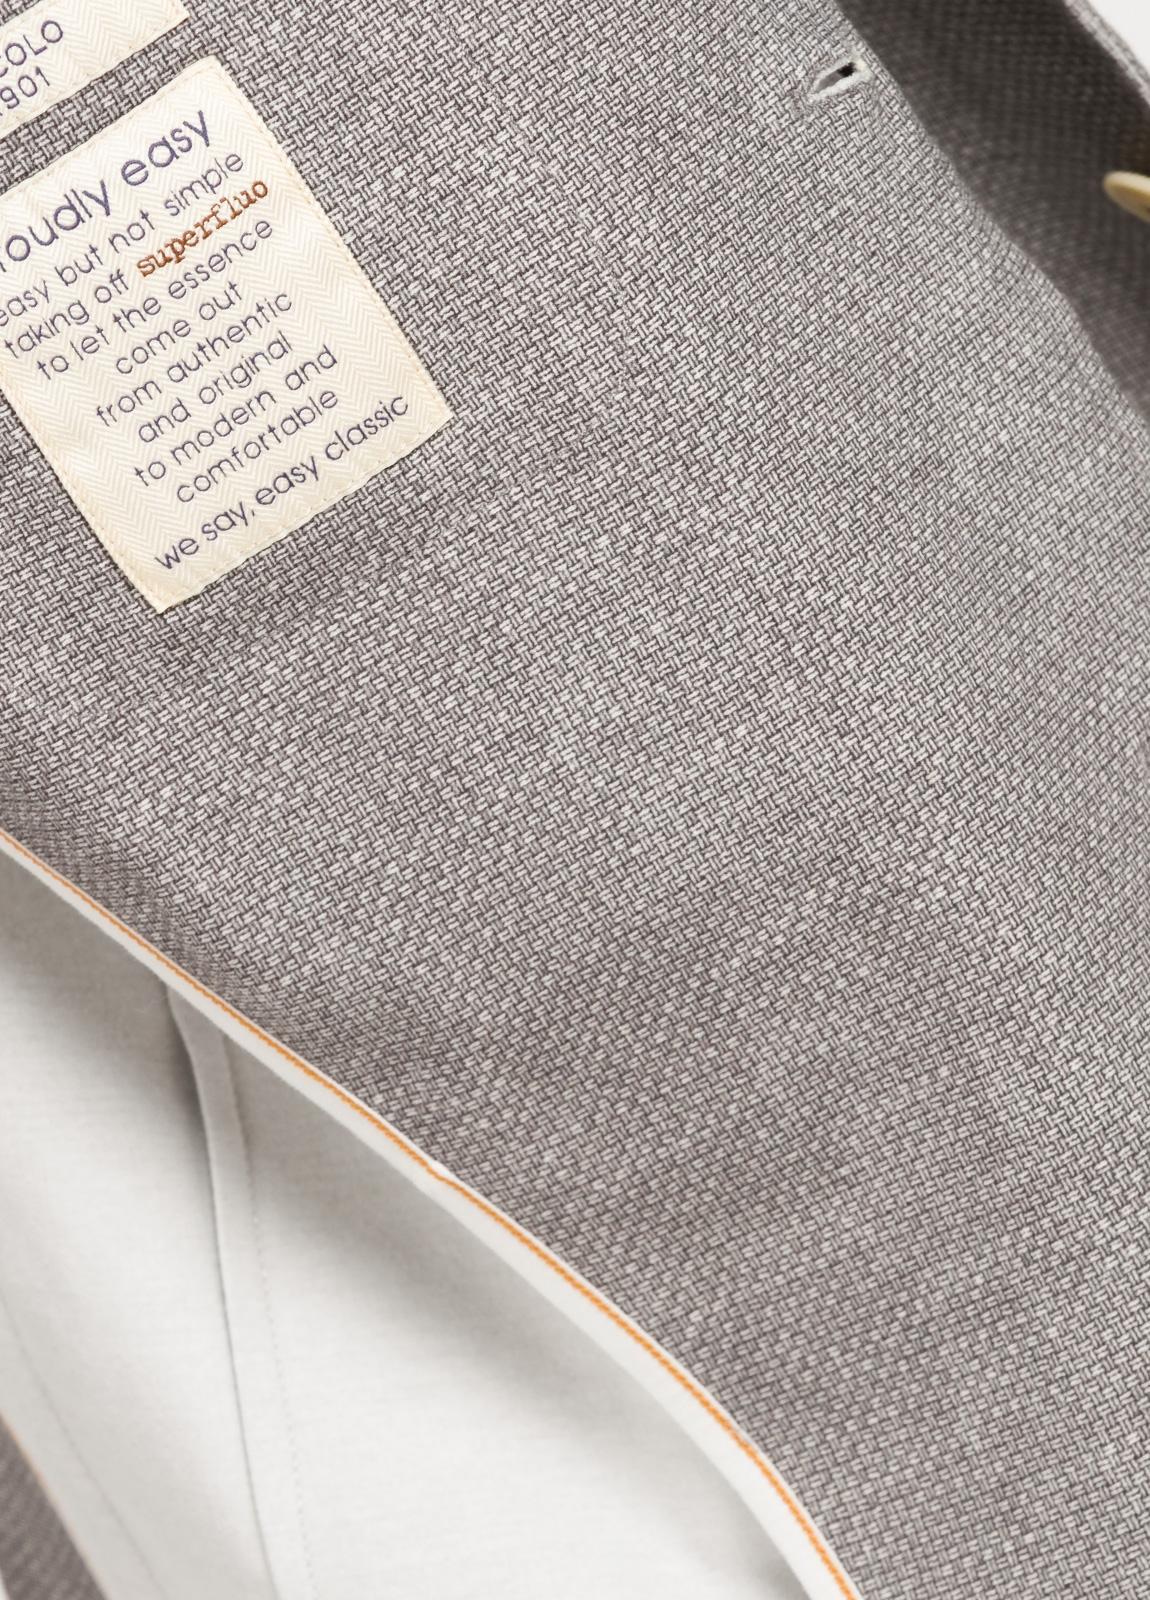 Americana soft 2 botones SLIM FIT esterilla color gris, Algodón. - Ítem1